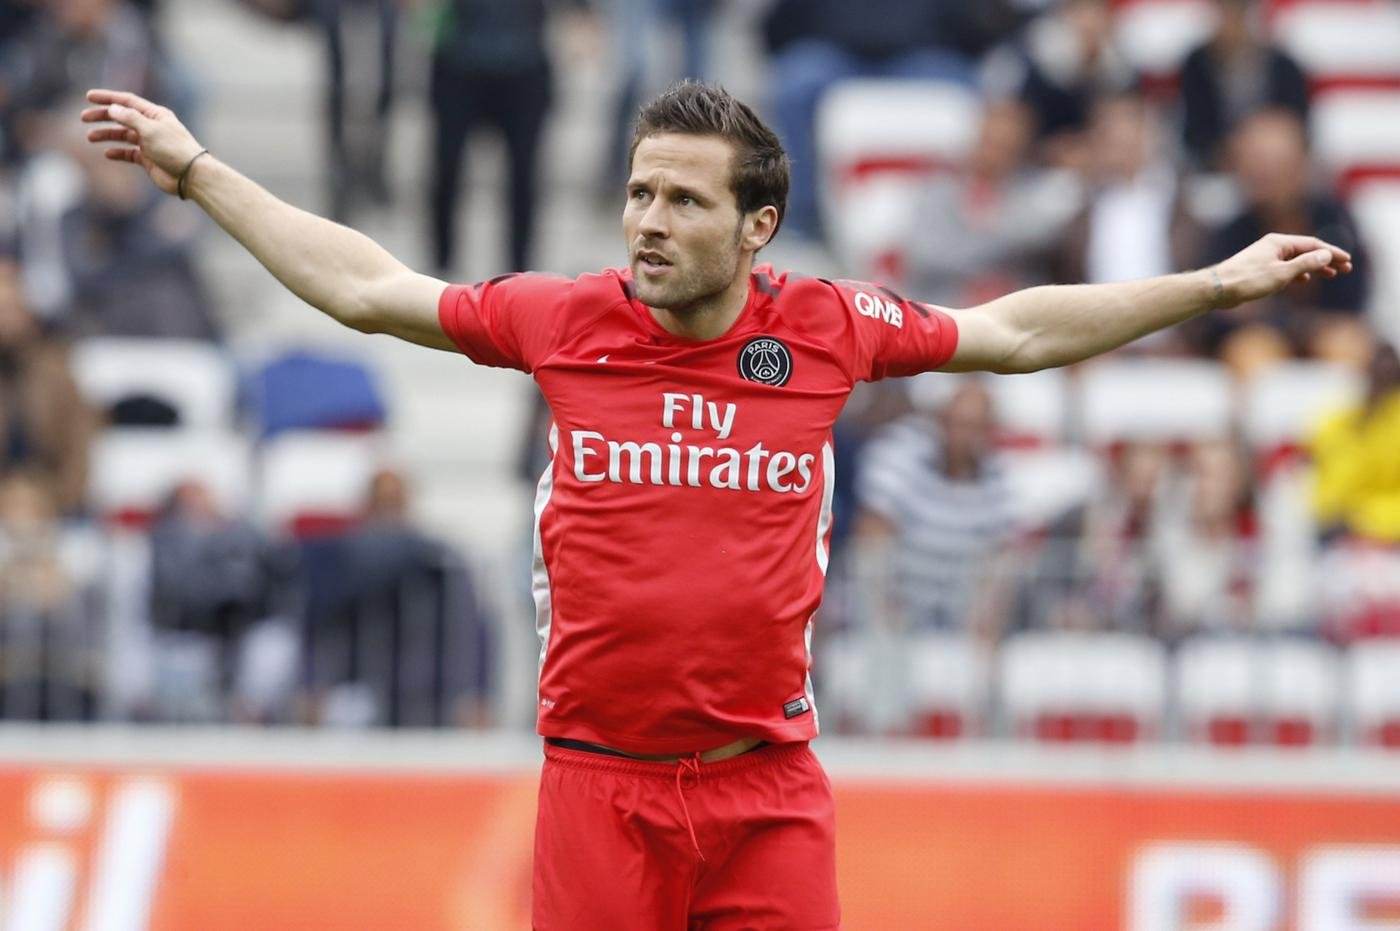 Liverpool 'join race to seal £10million transfer of Paris St Germain midfielder Yohan Cabaye'